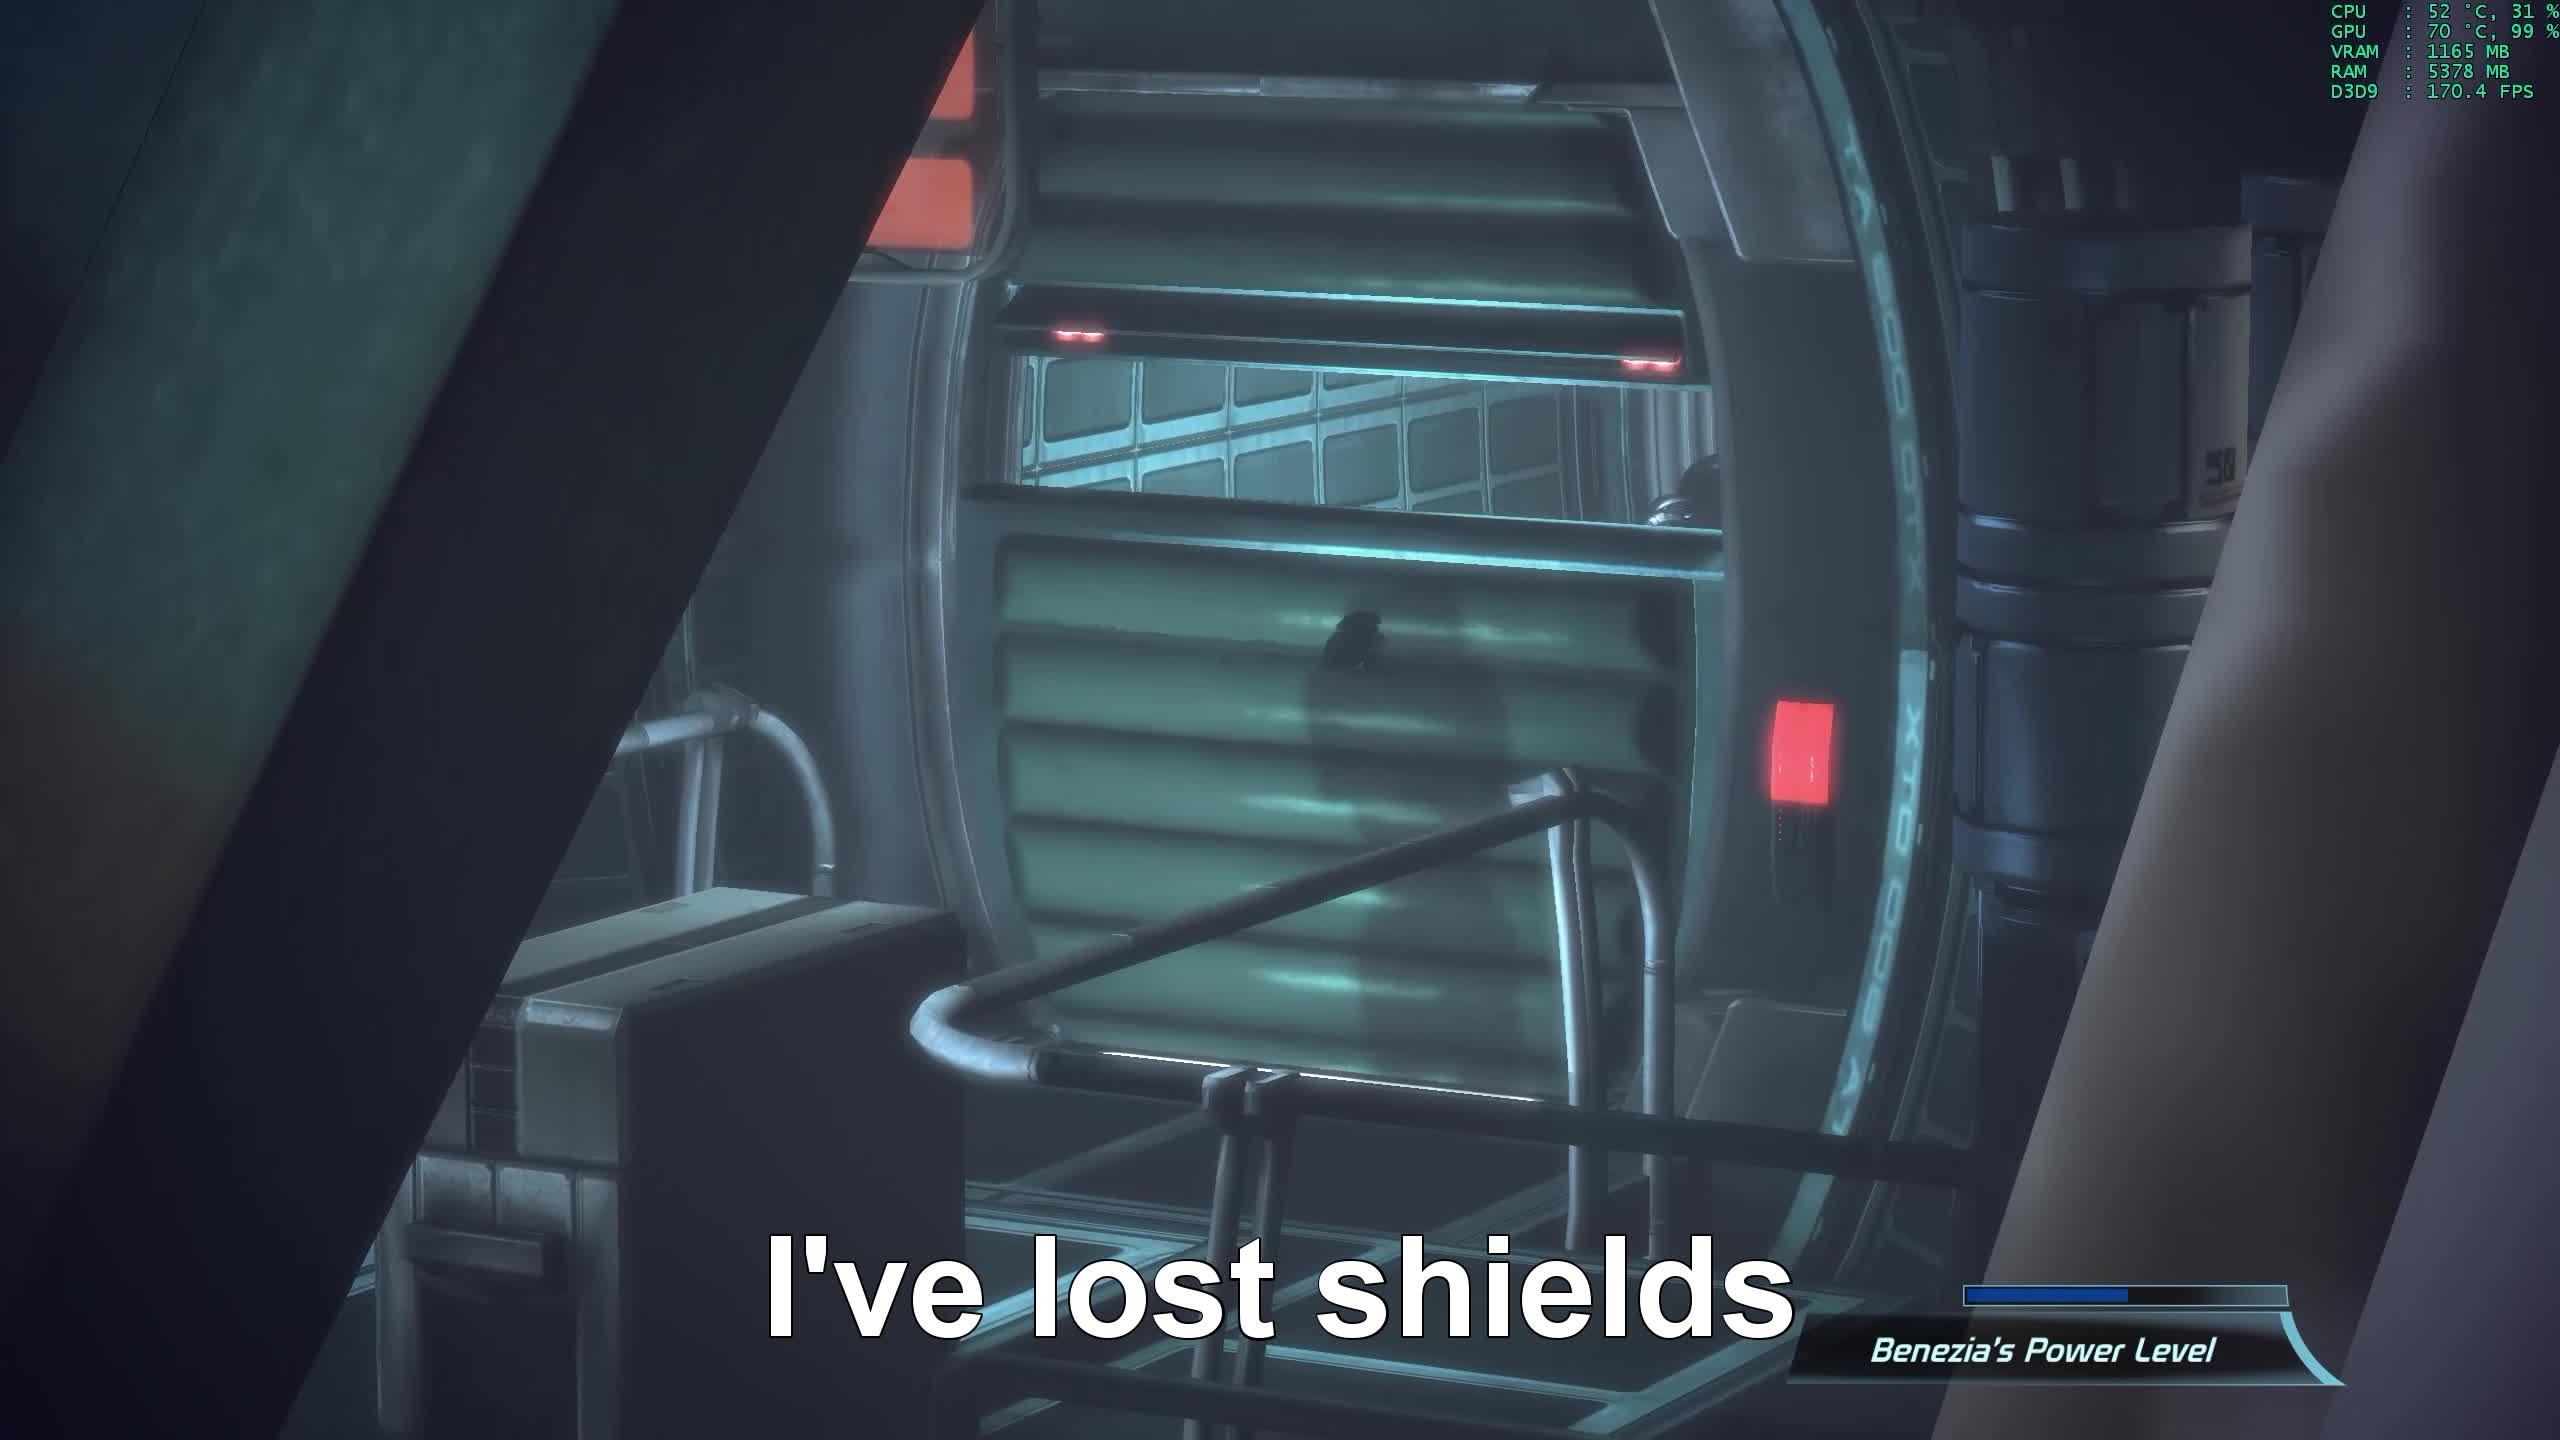 gamephysics, glitch, mass effect, I've lost shields GIFs